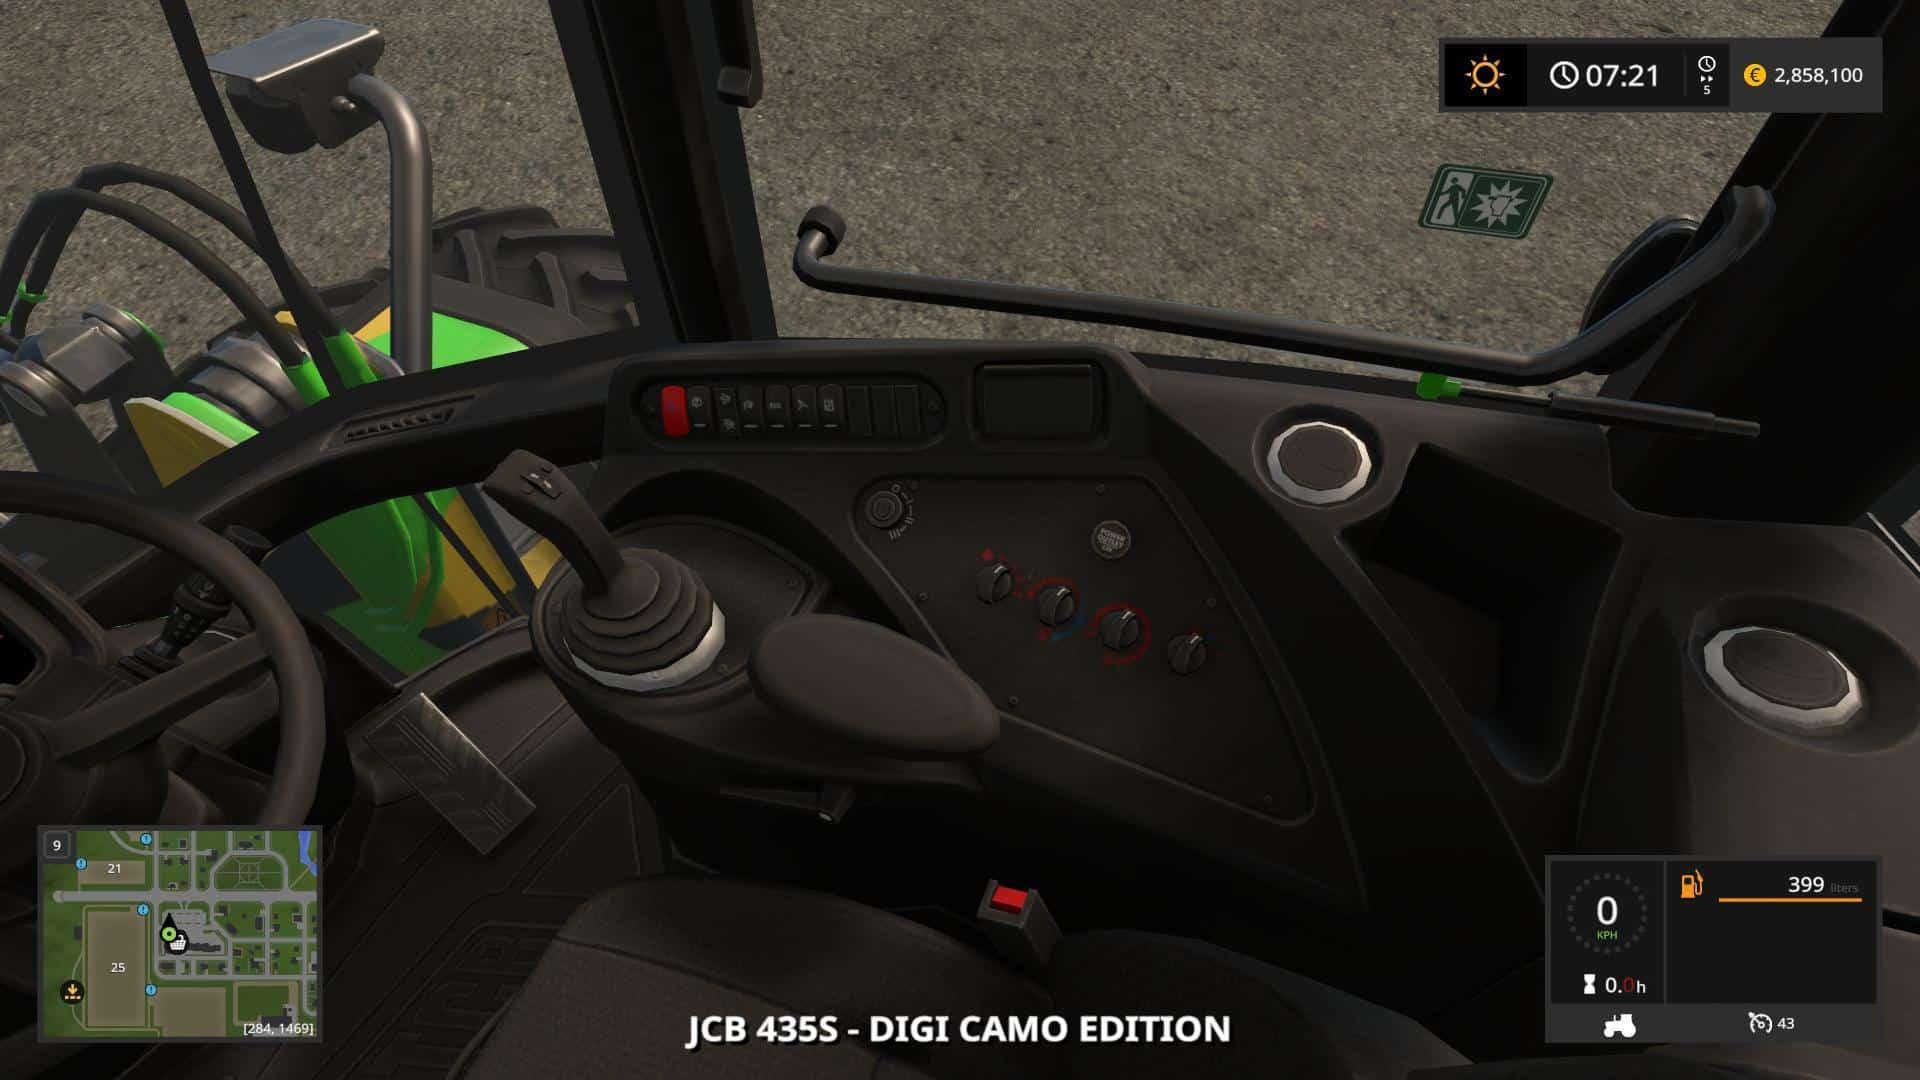 JCB 435S DIGITAL CAMO EDITION v1.2